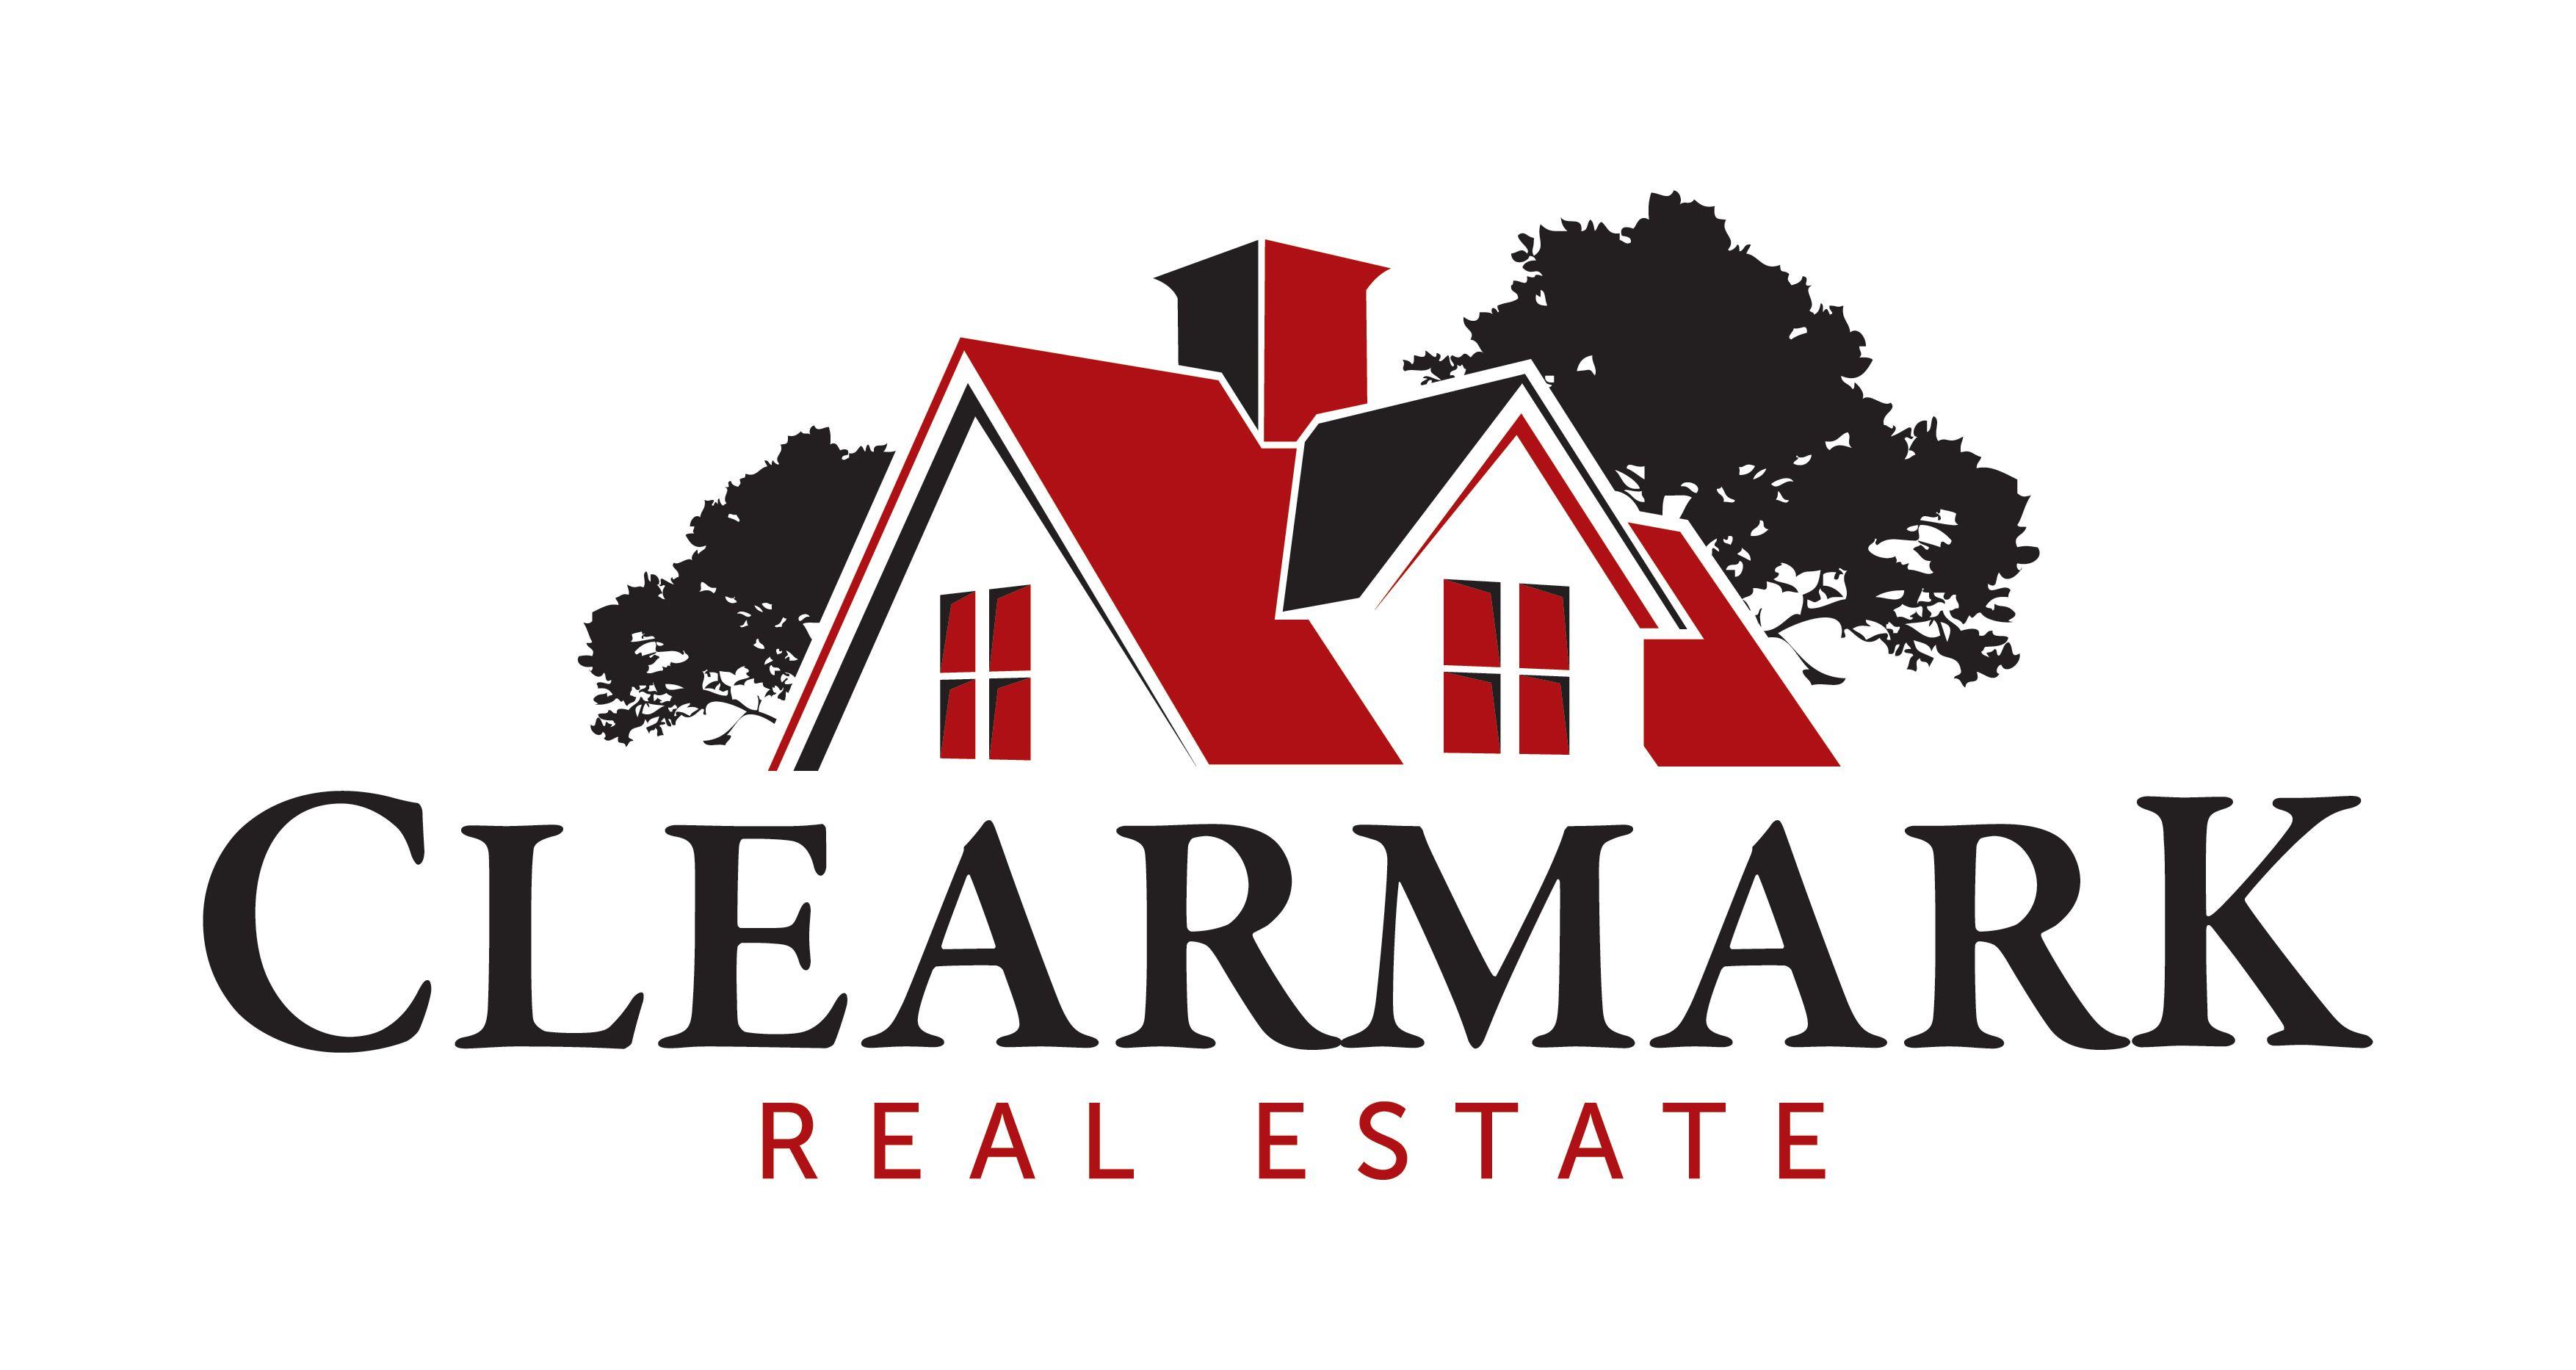 Clearmark Real Estate